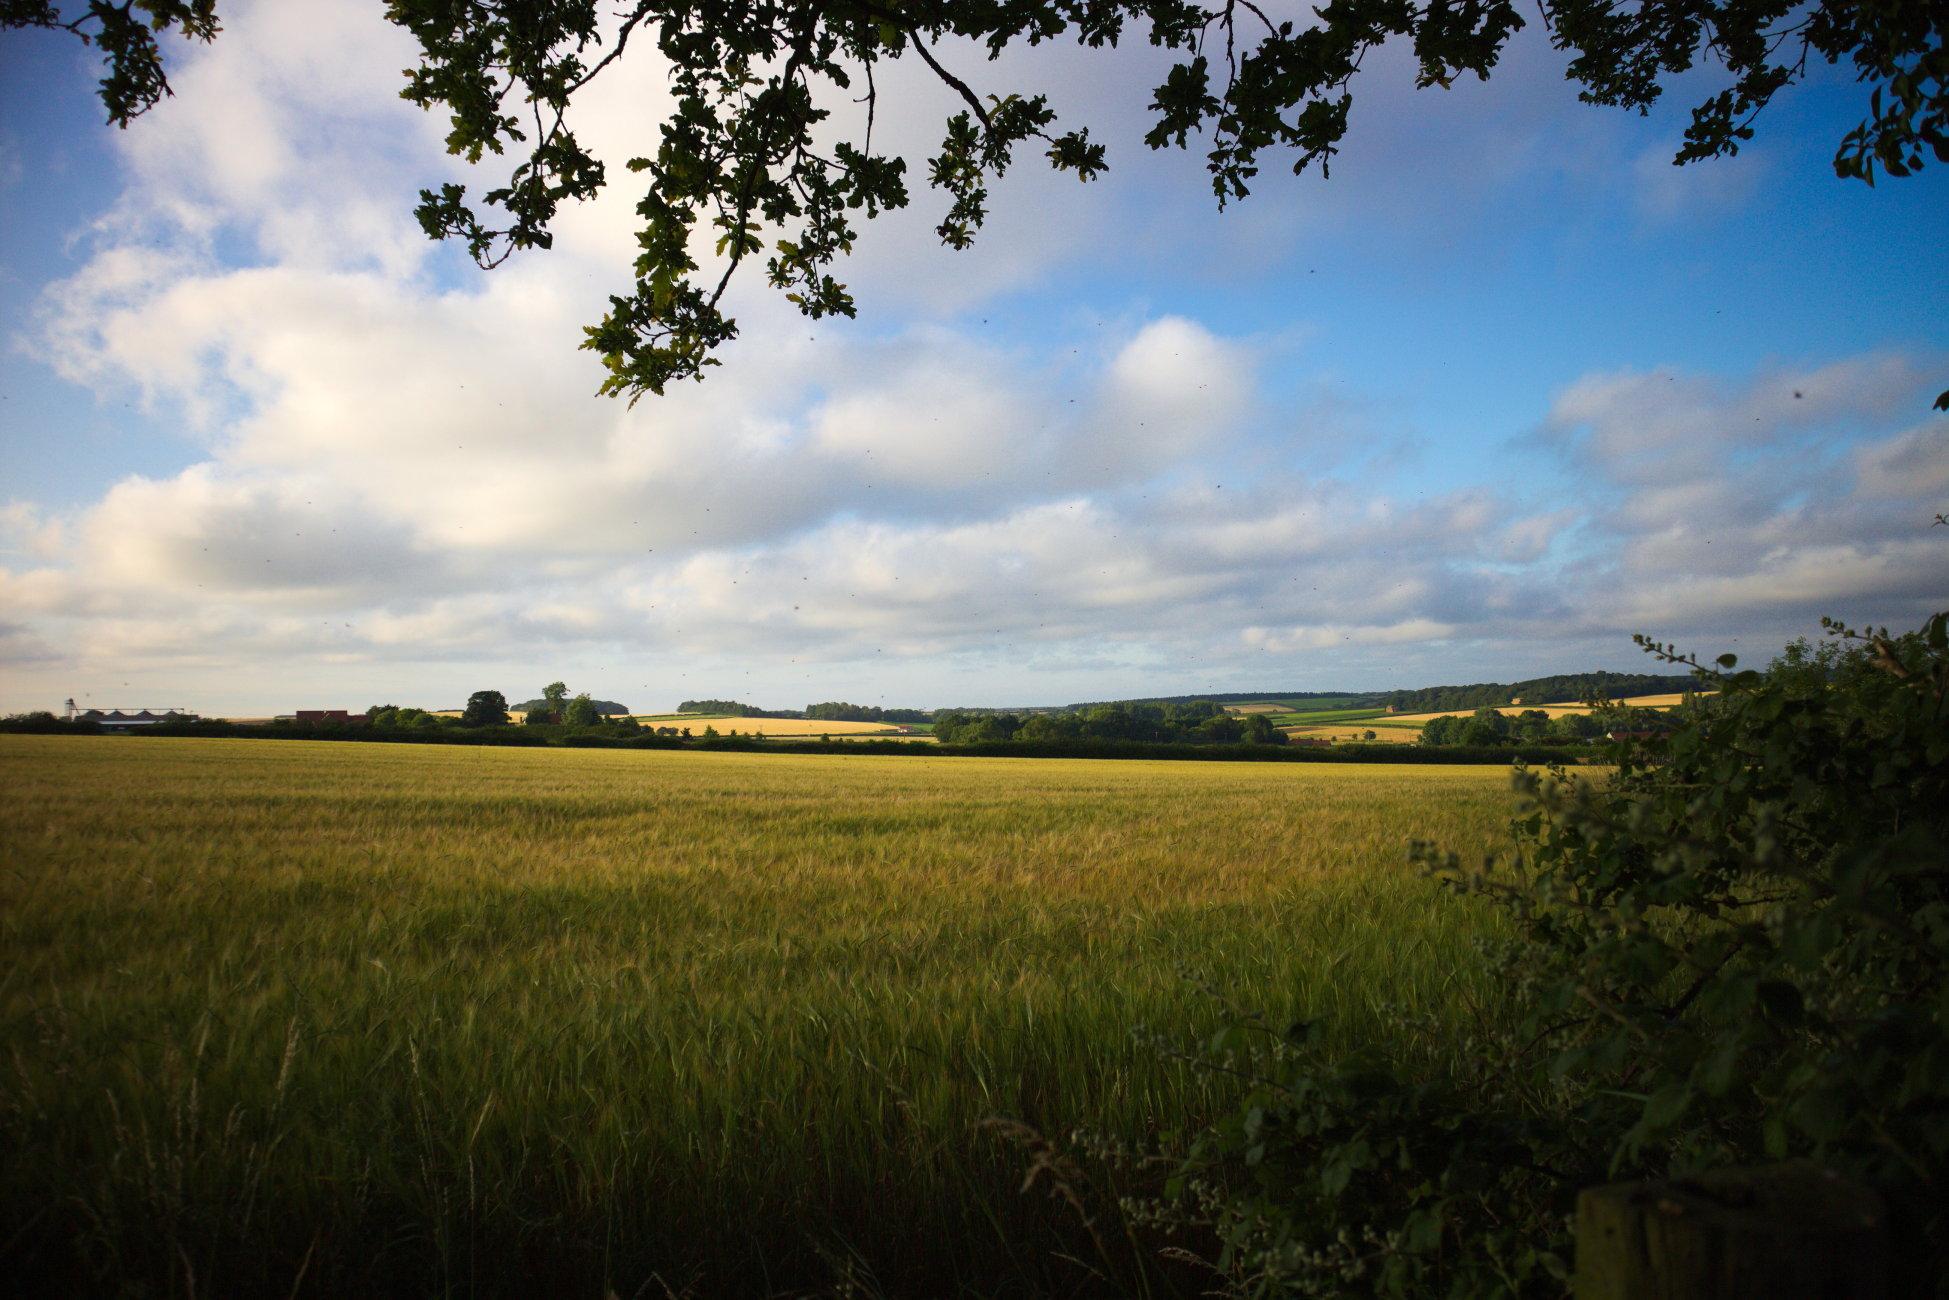 Northcreek fields Norfolk